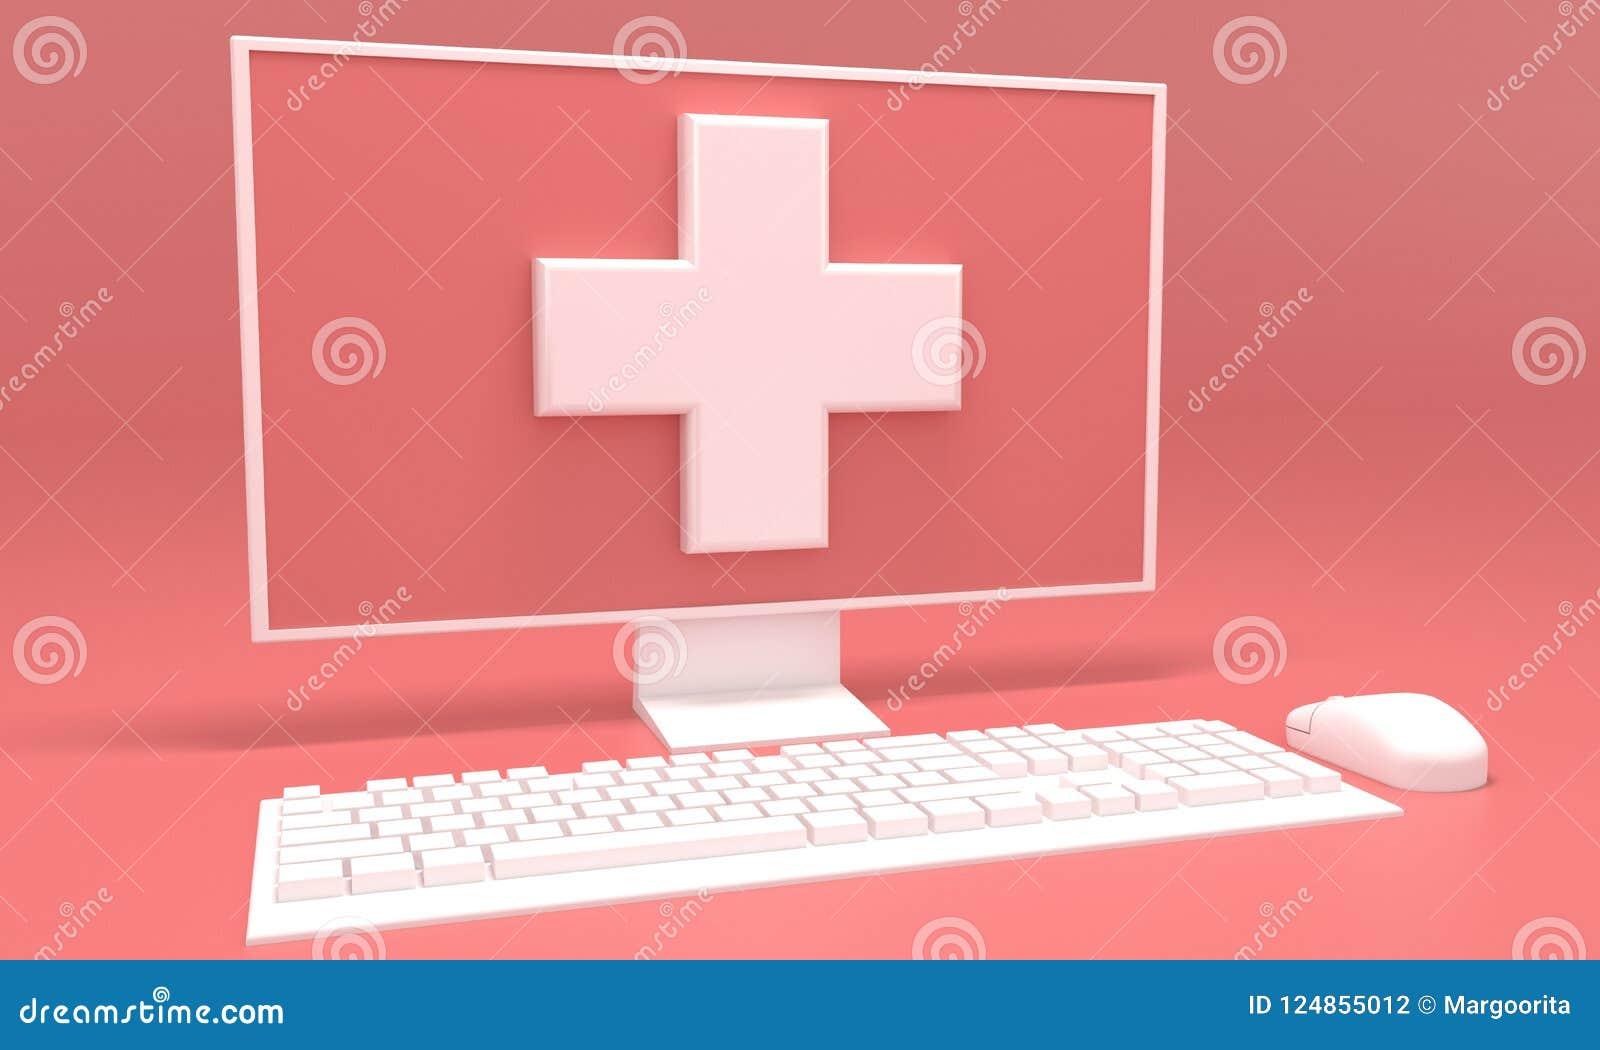 Medical Advice Online 3d Rendering